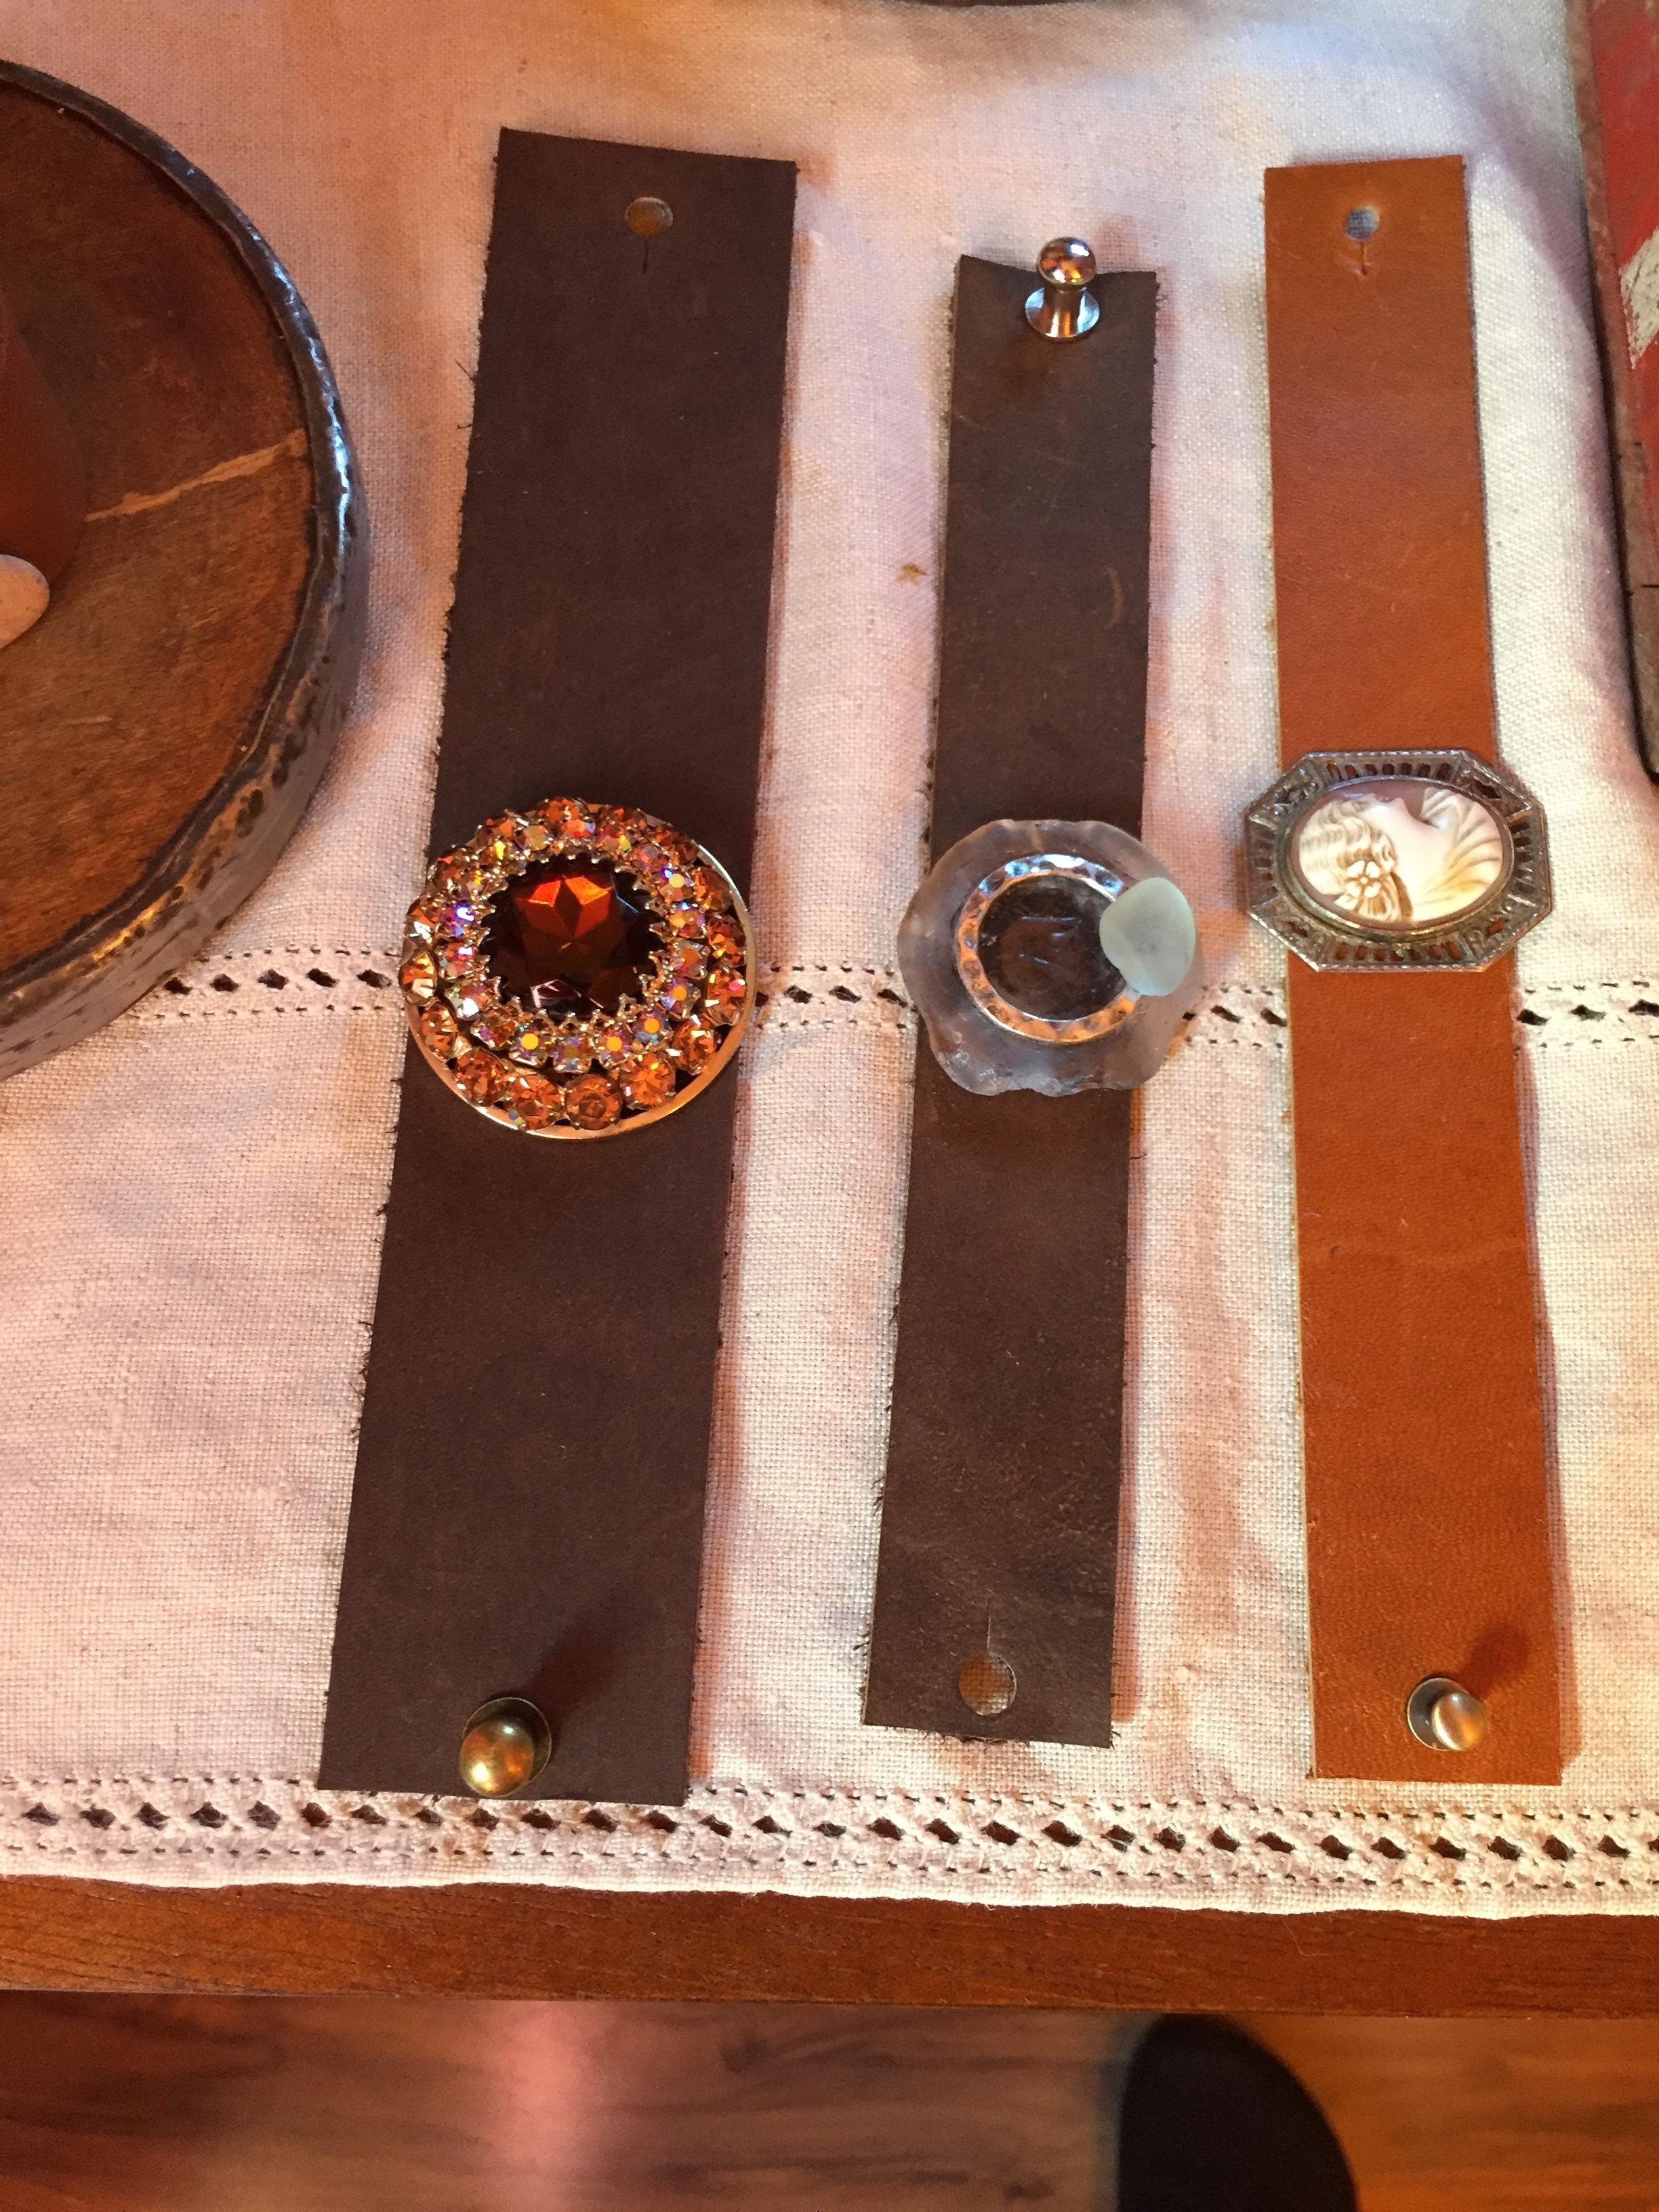 Family heirloom cuffs